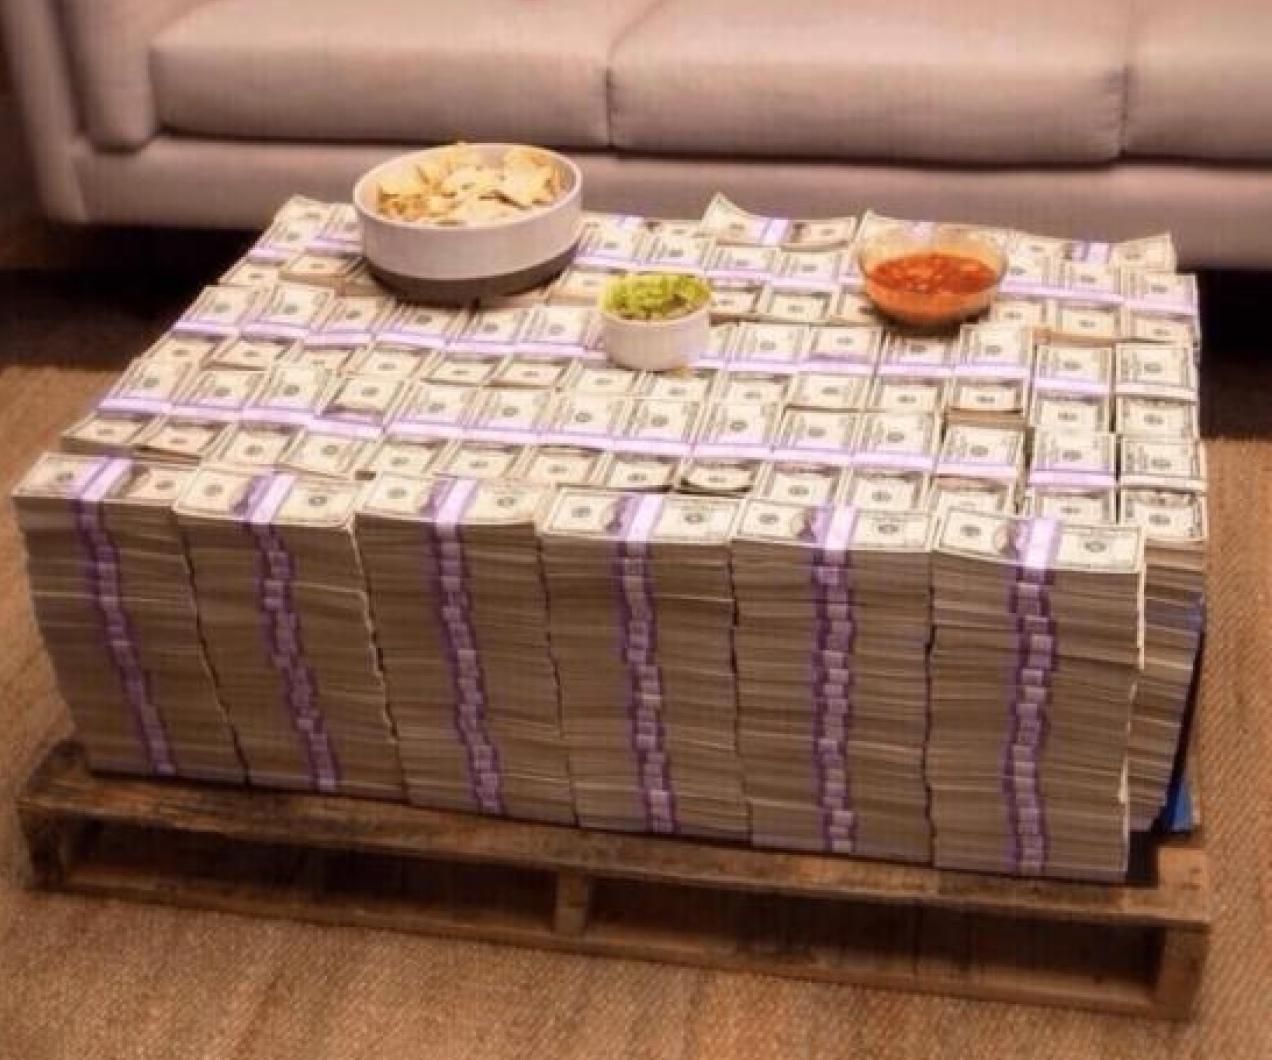 Brali by ste takýto stôl?